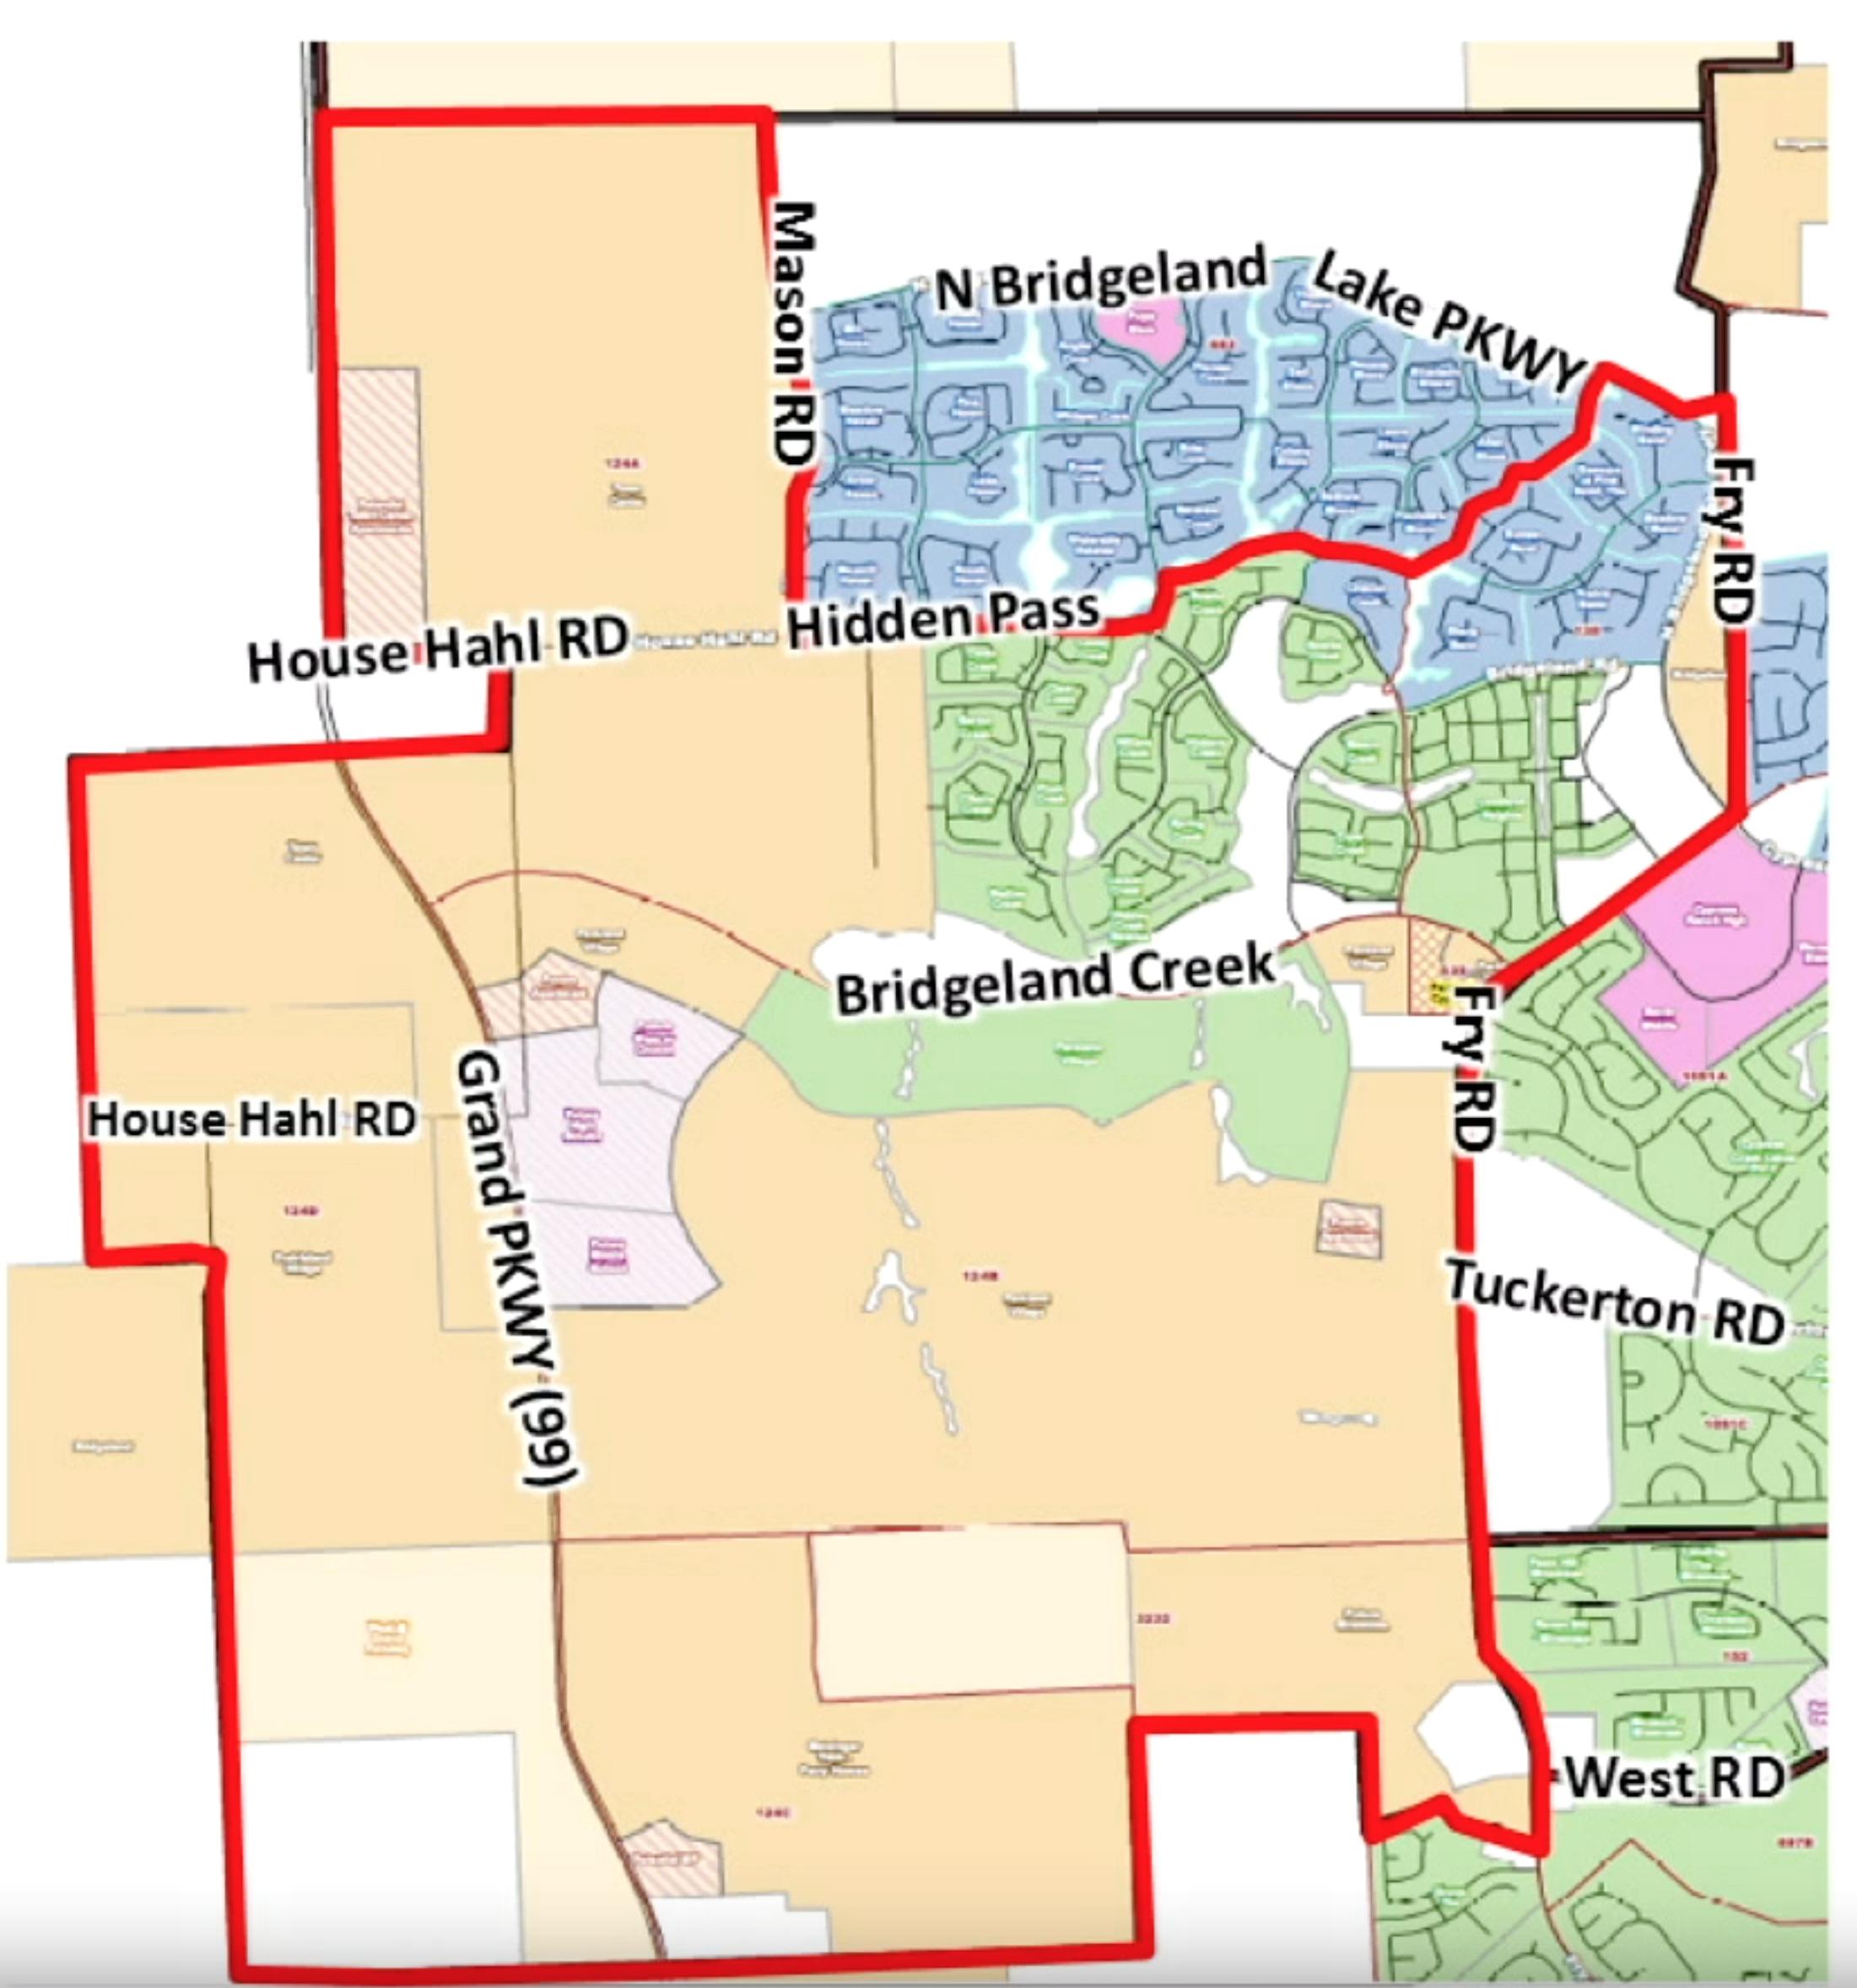 2017-2018 Bridgeland School Boundary Proposal